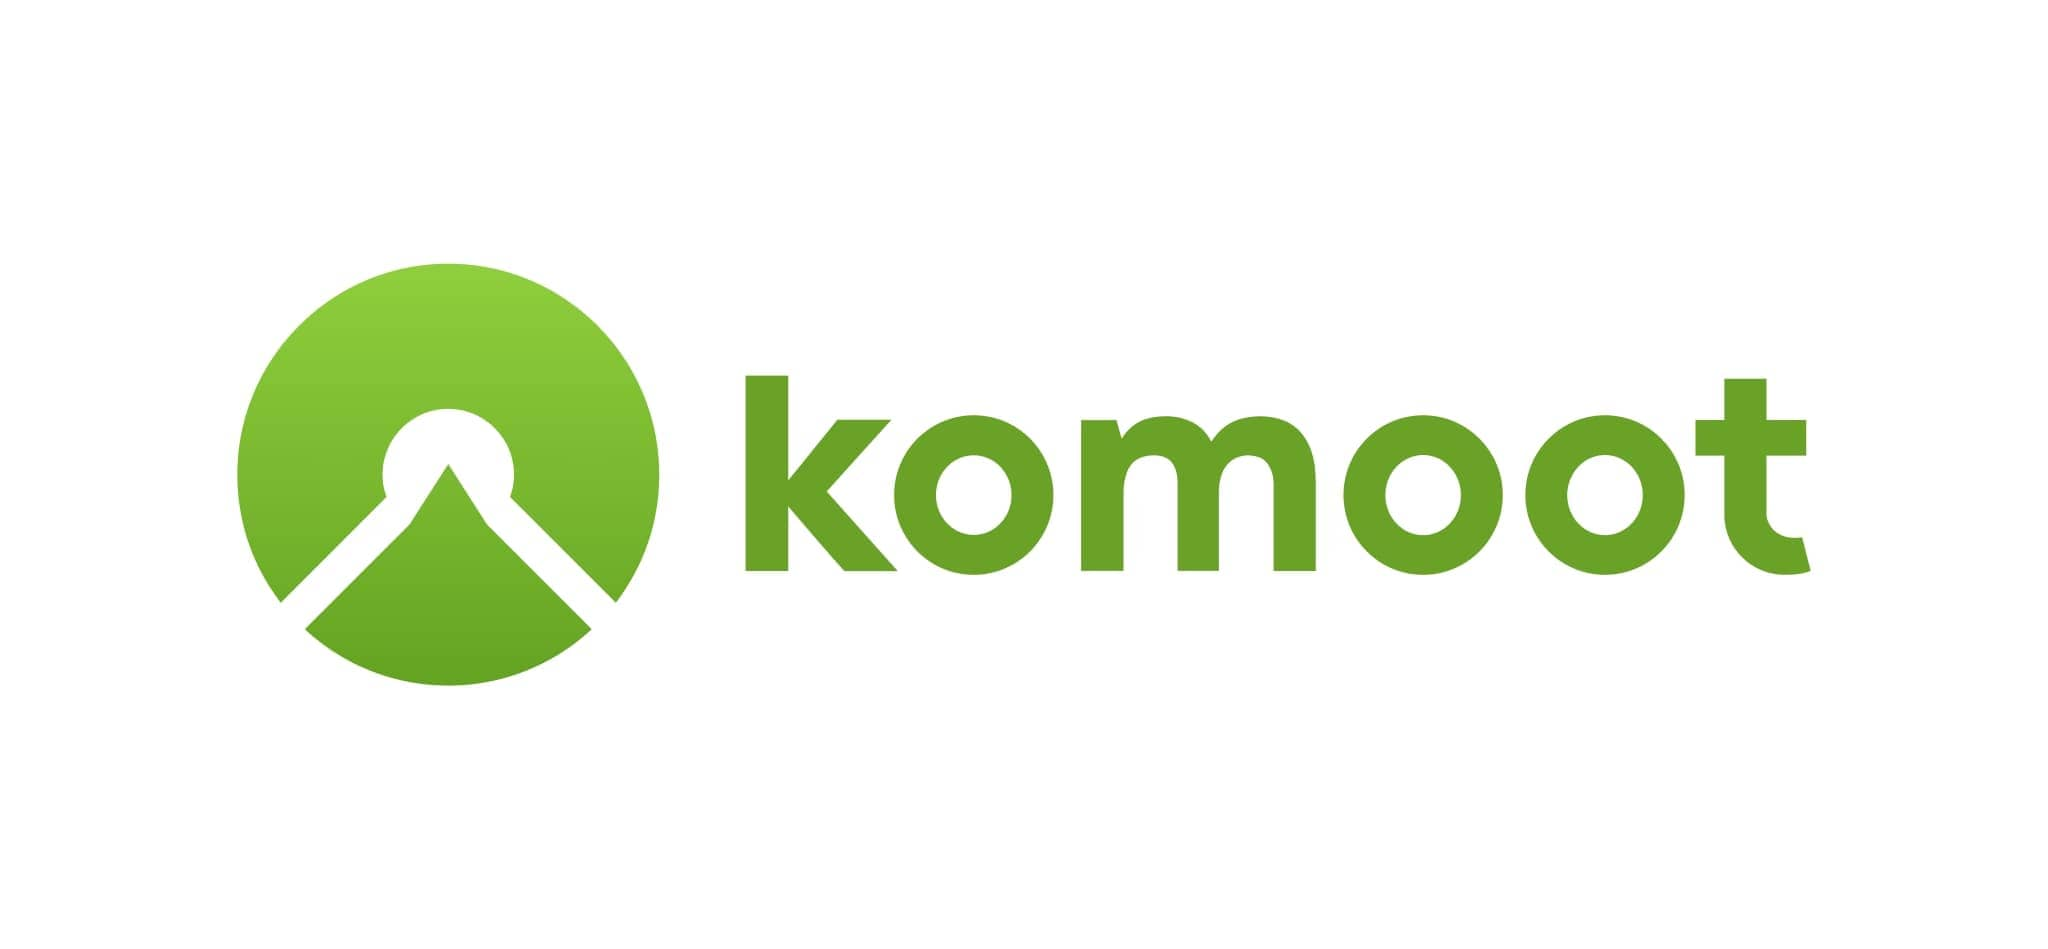 application-de-randonnee-komoot-logo